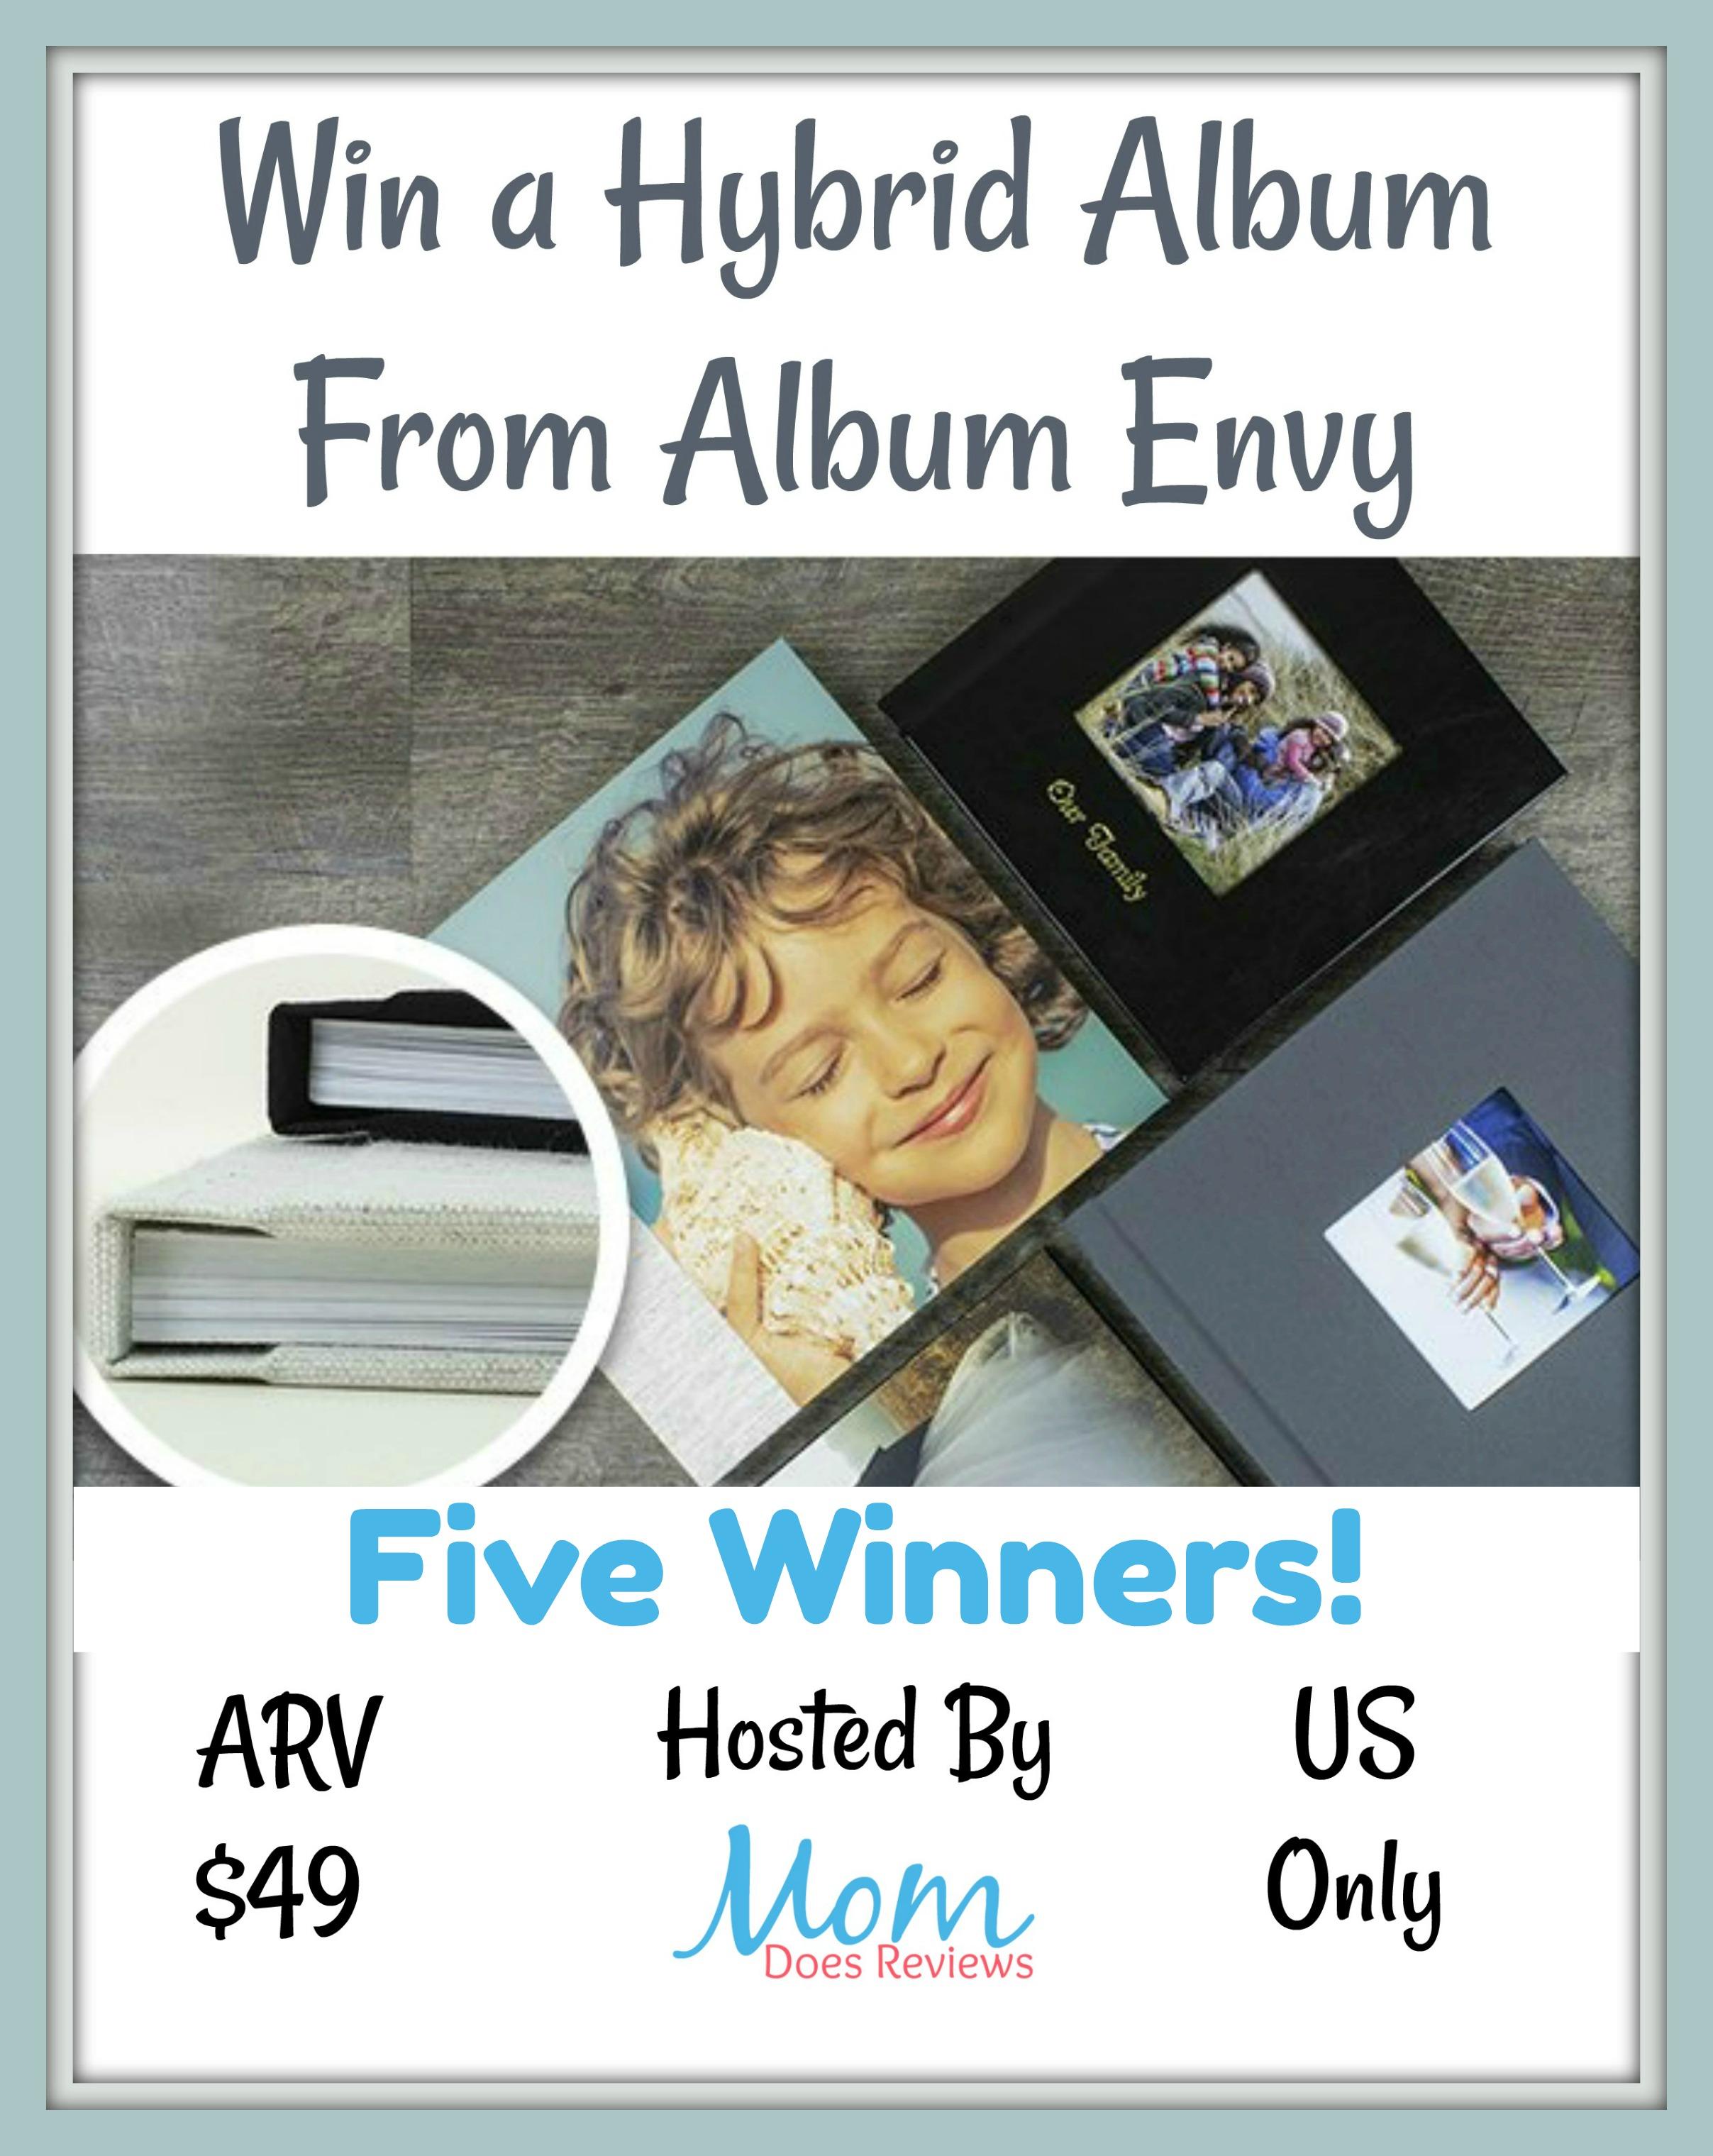 5 winners Album Envy